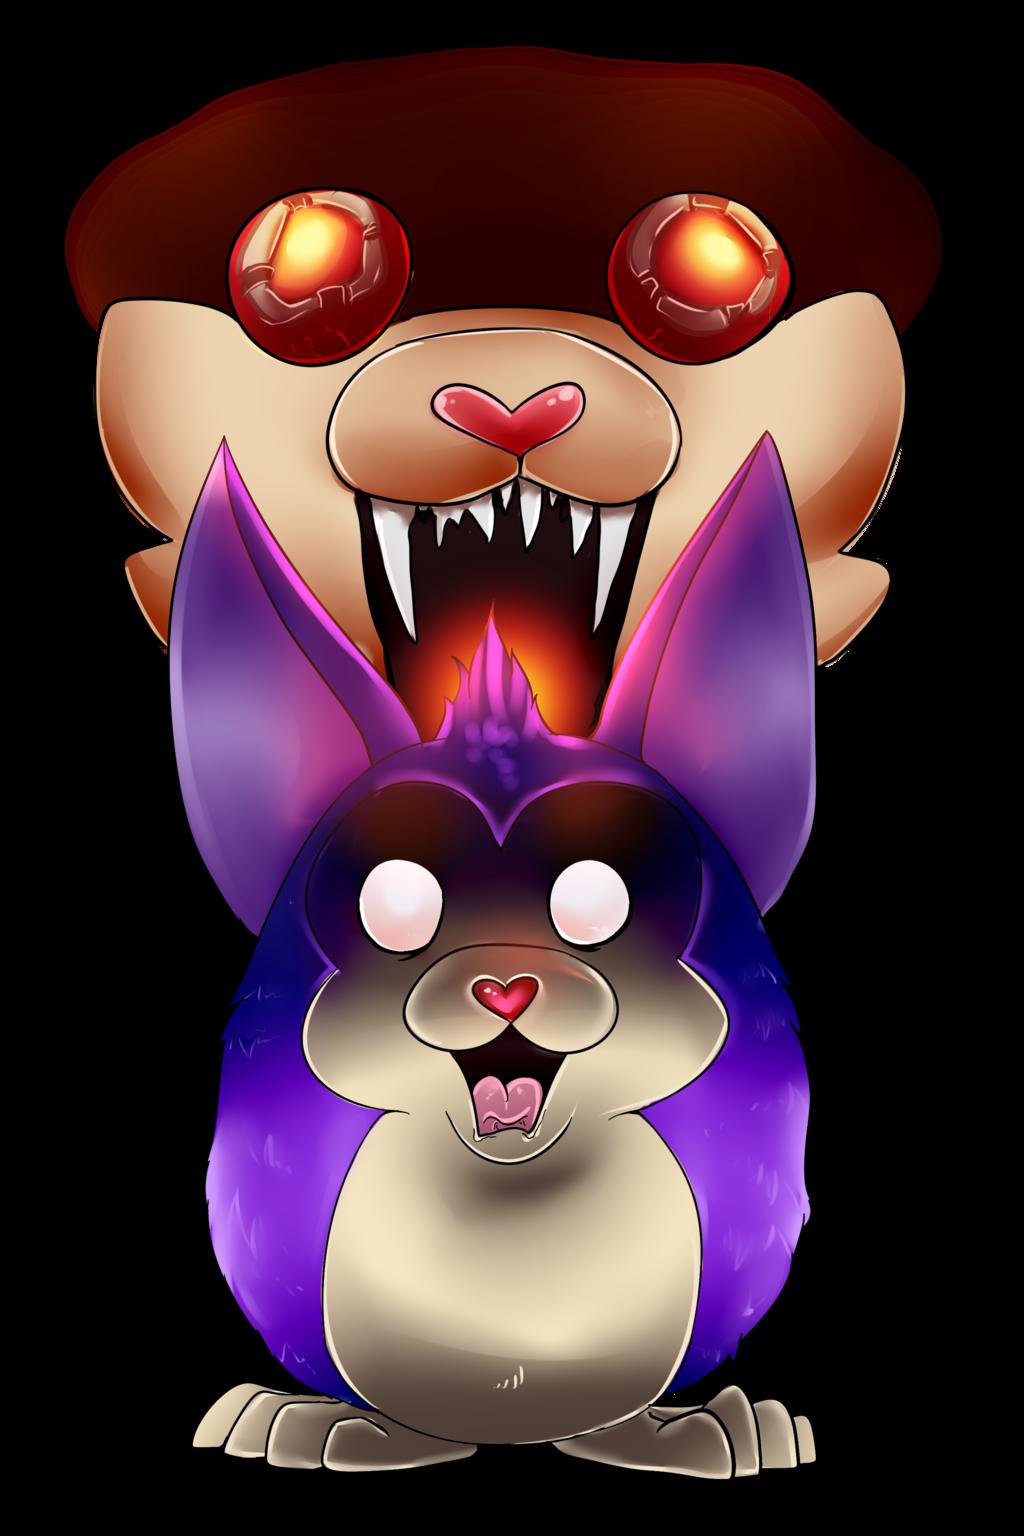 Scary clipart bunny #6